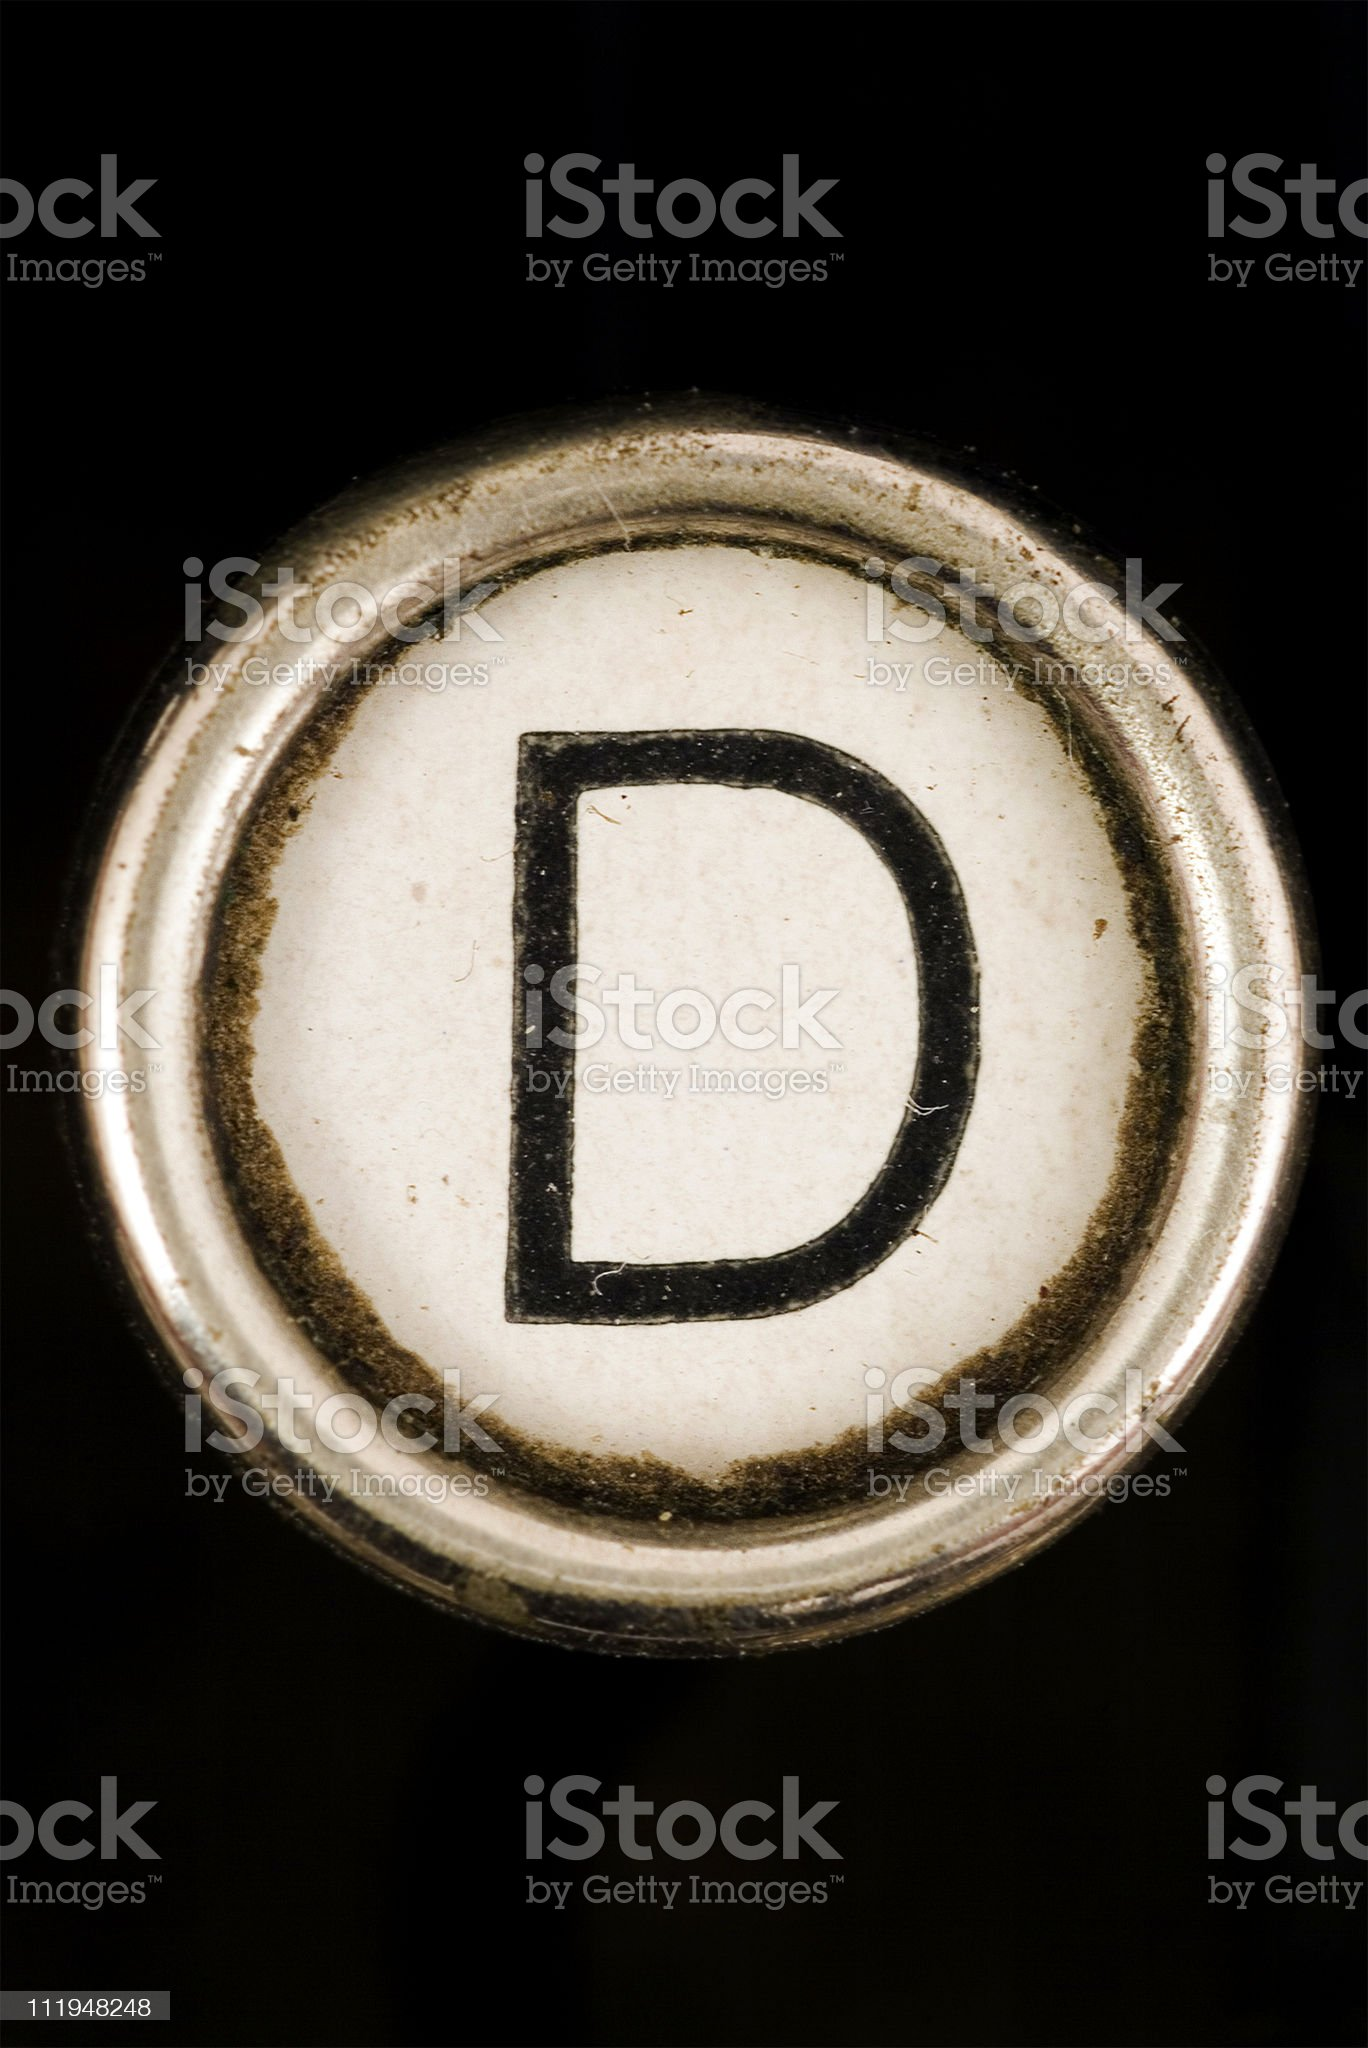 D key of a full alphabet from grungey typewriter royalty-free stock photo